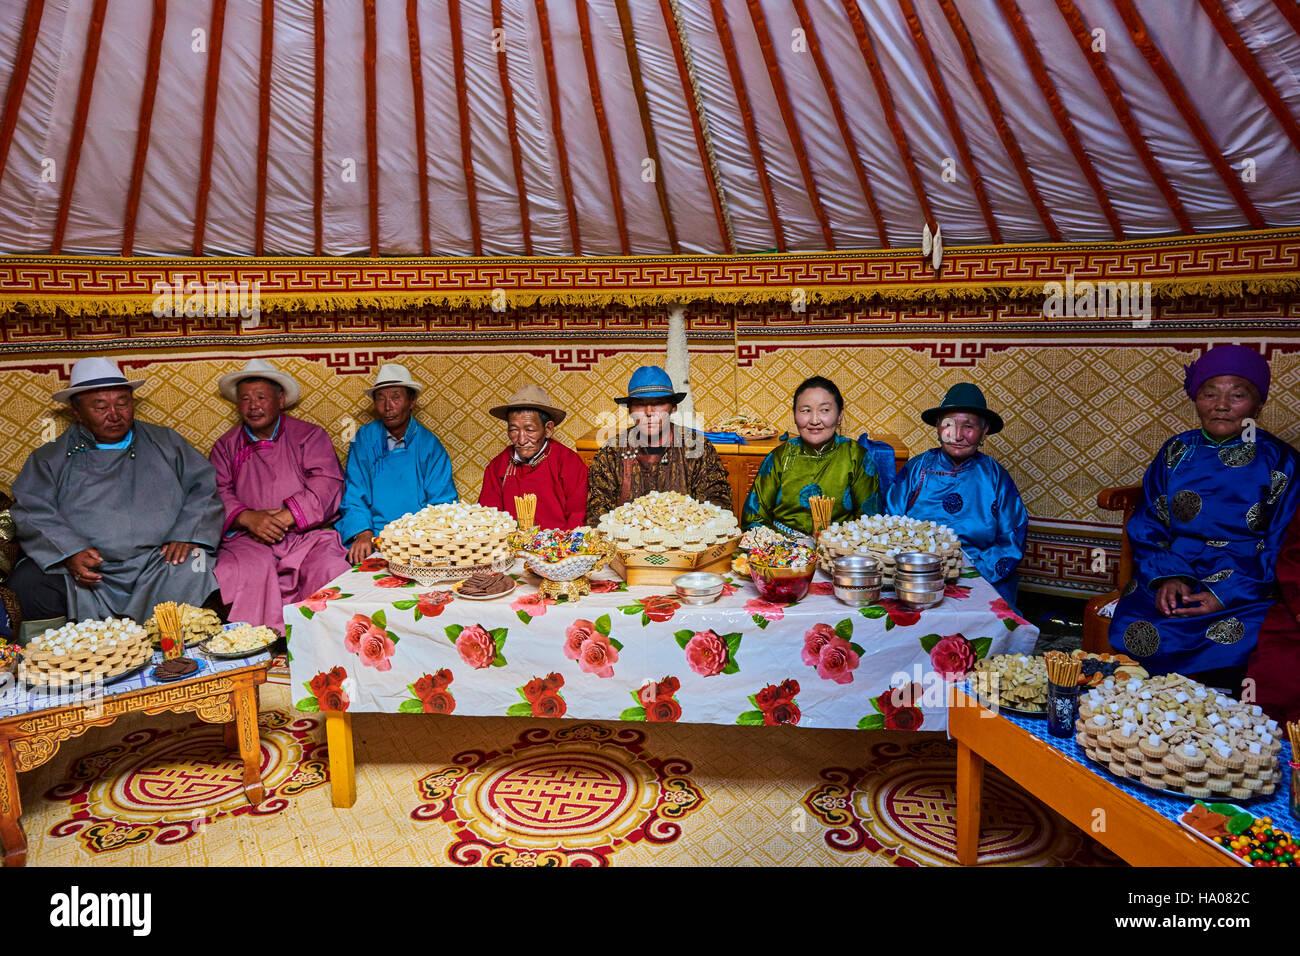 Mongolia, Uvs province, western Mongolia, wedding festival in the yurt - Stock Image